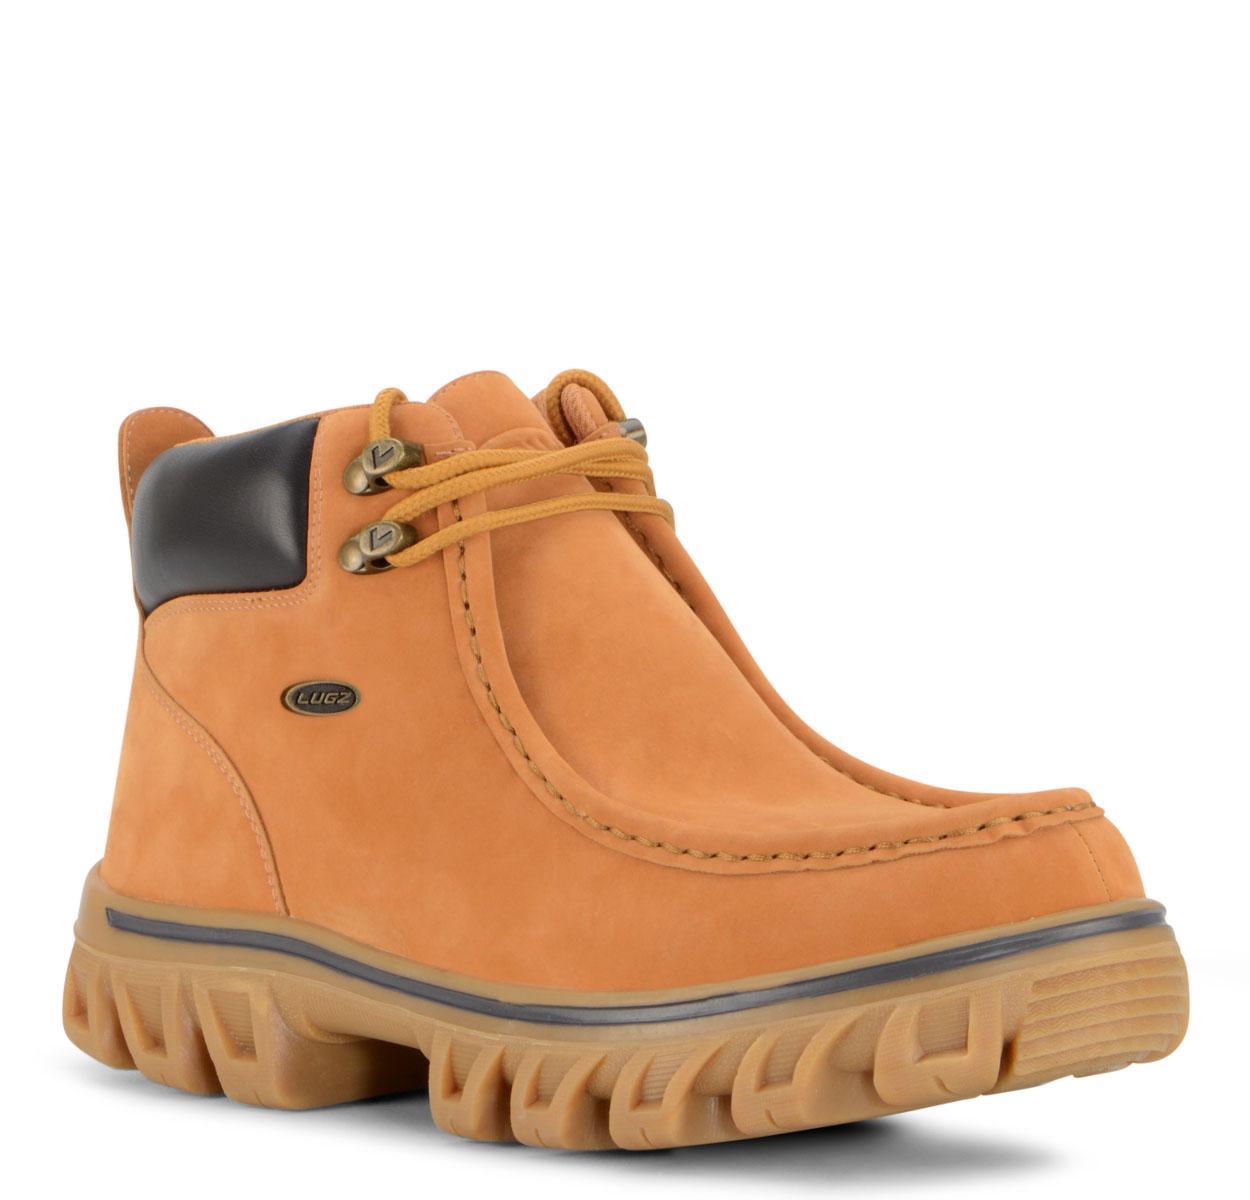 Men's Rubicon Chukka Boot (Choose Your Color: GOLDEN WHEAT/BARK/GUM, Choose Your Size: 10.0)